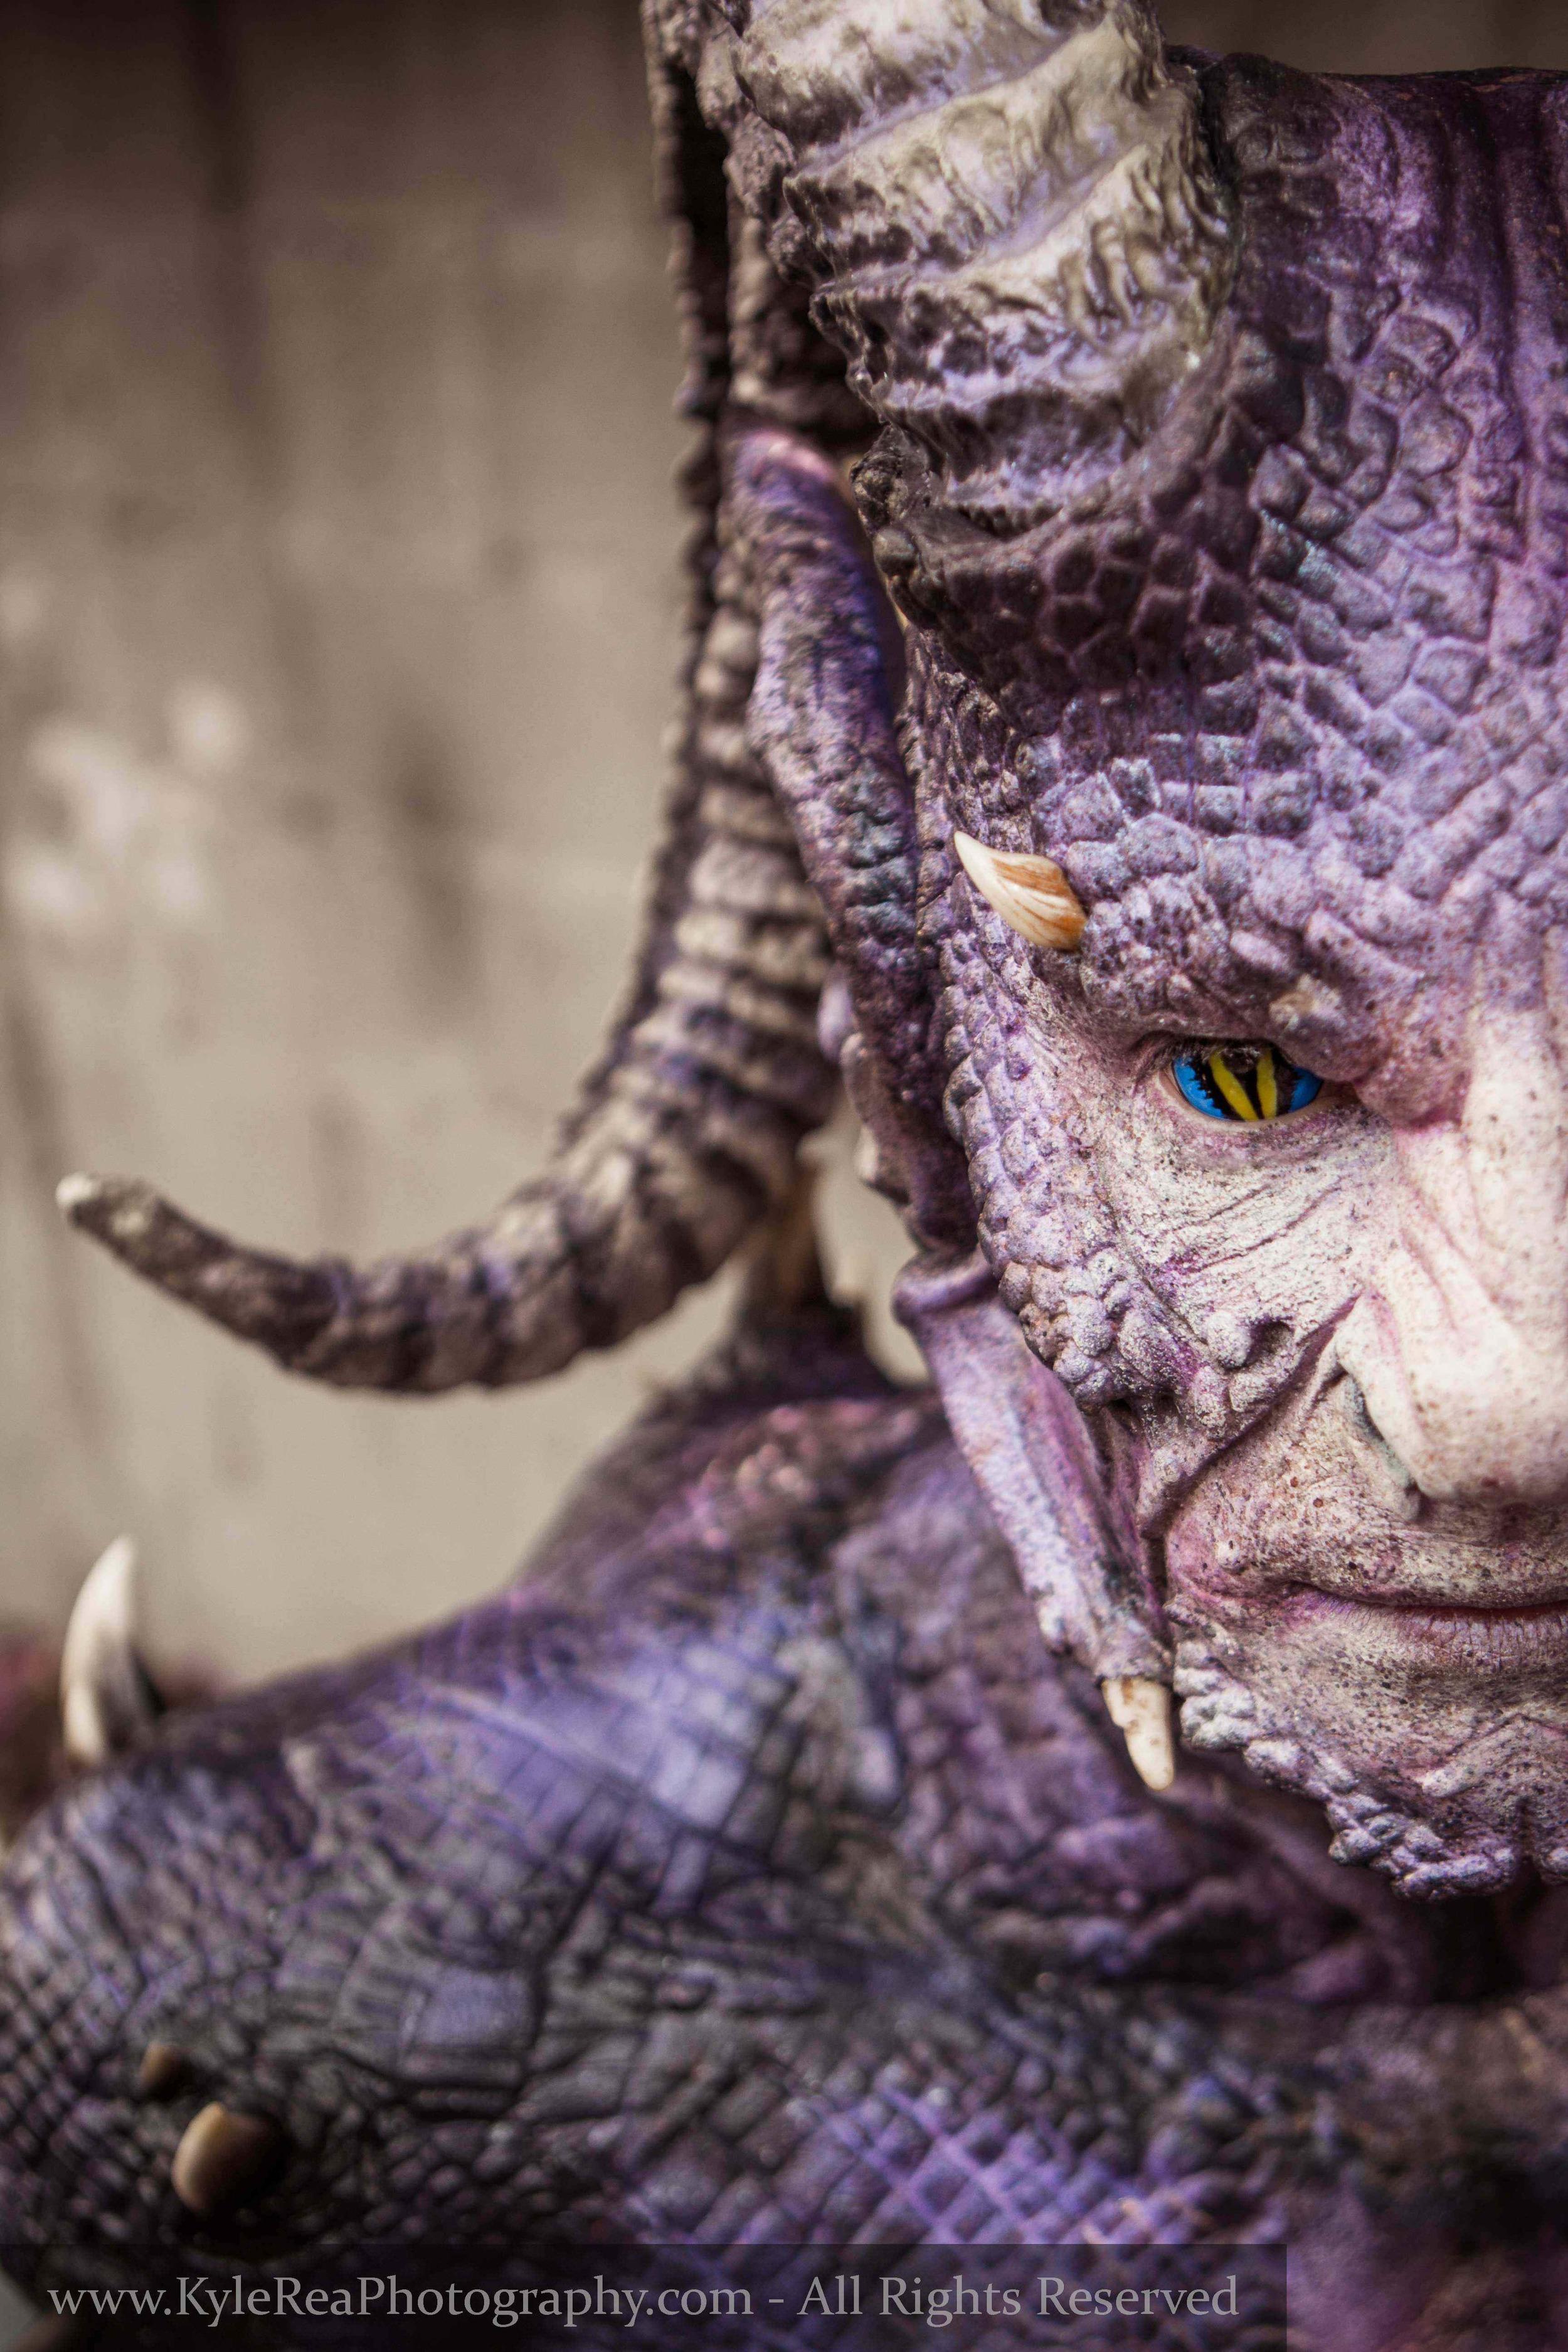 SFX Special Effects - Josef Rarach - Vlad Taupesh - Kyle Rea Photography - cREAtive Castle Studios 6 Edit copy.jpg